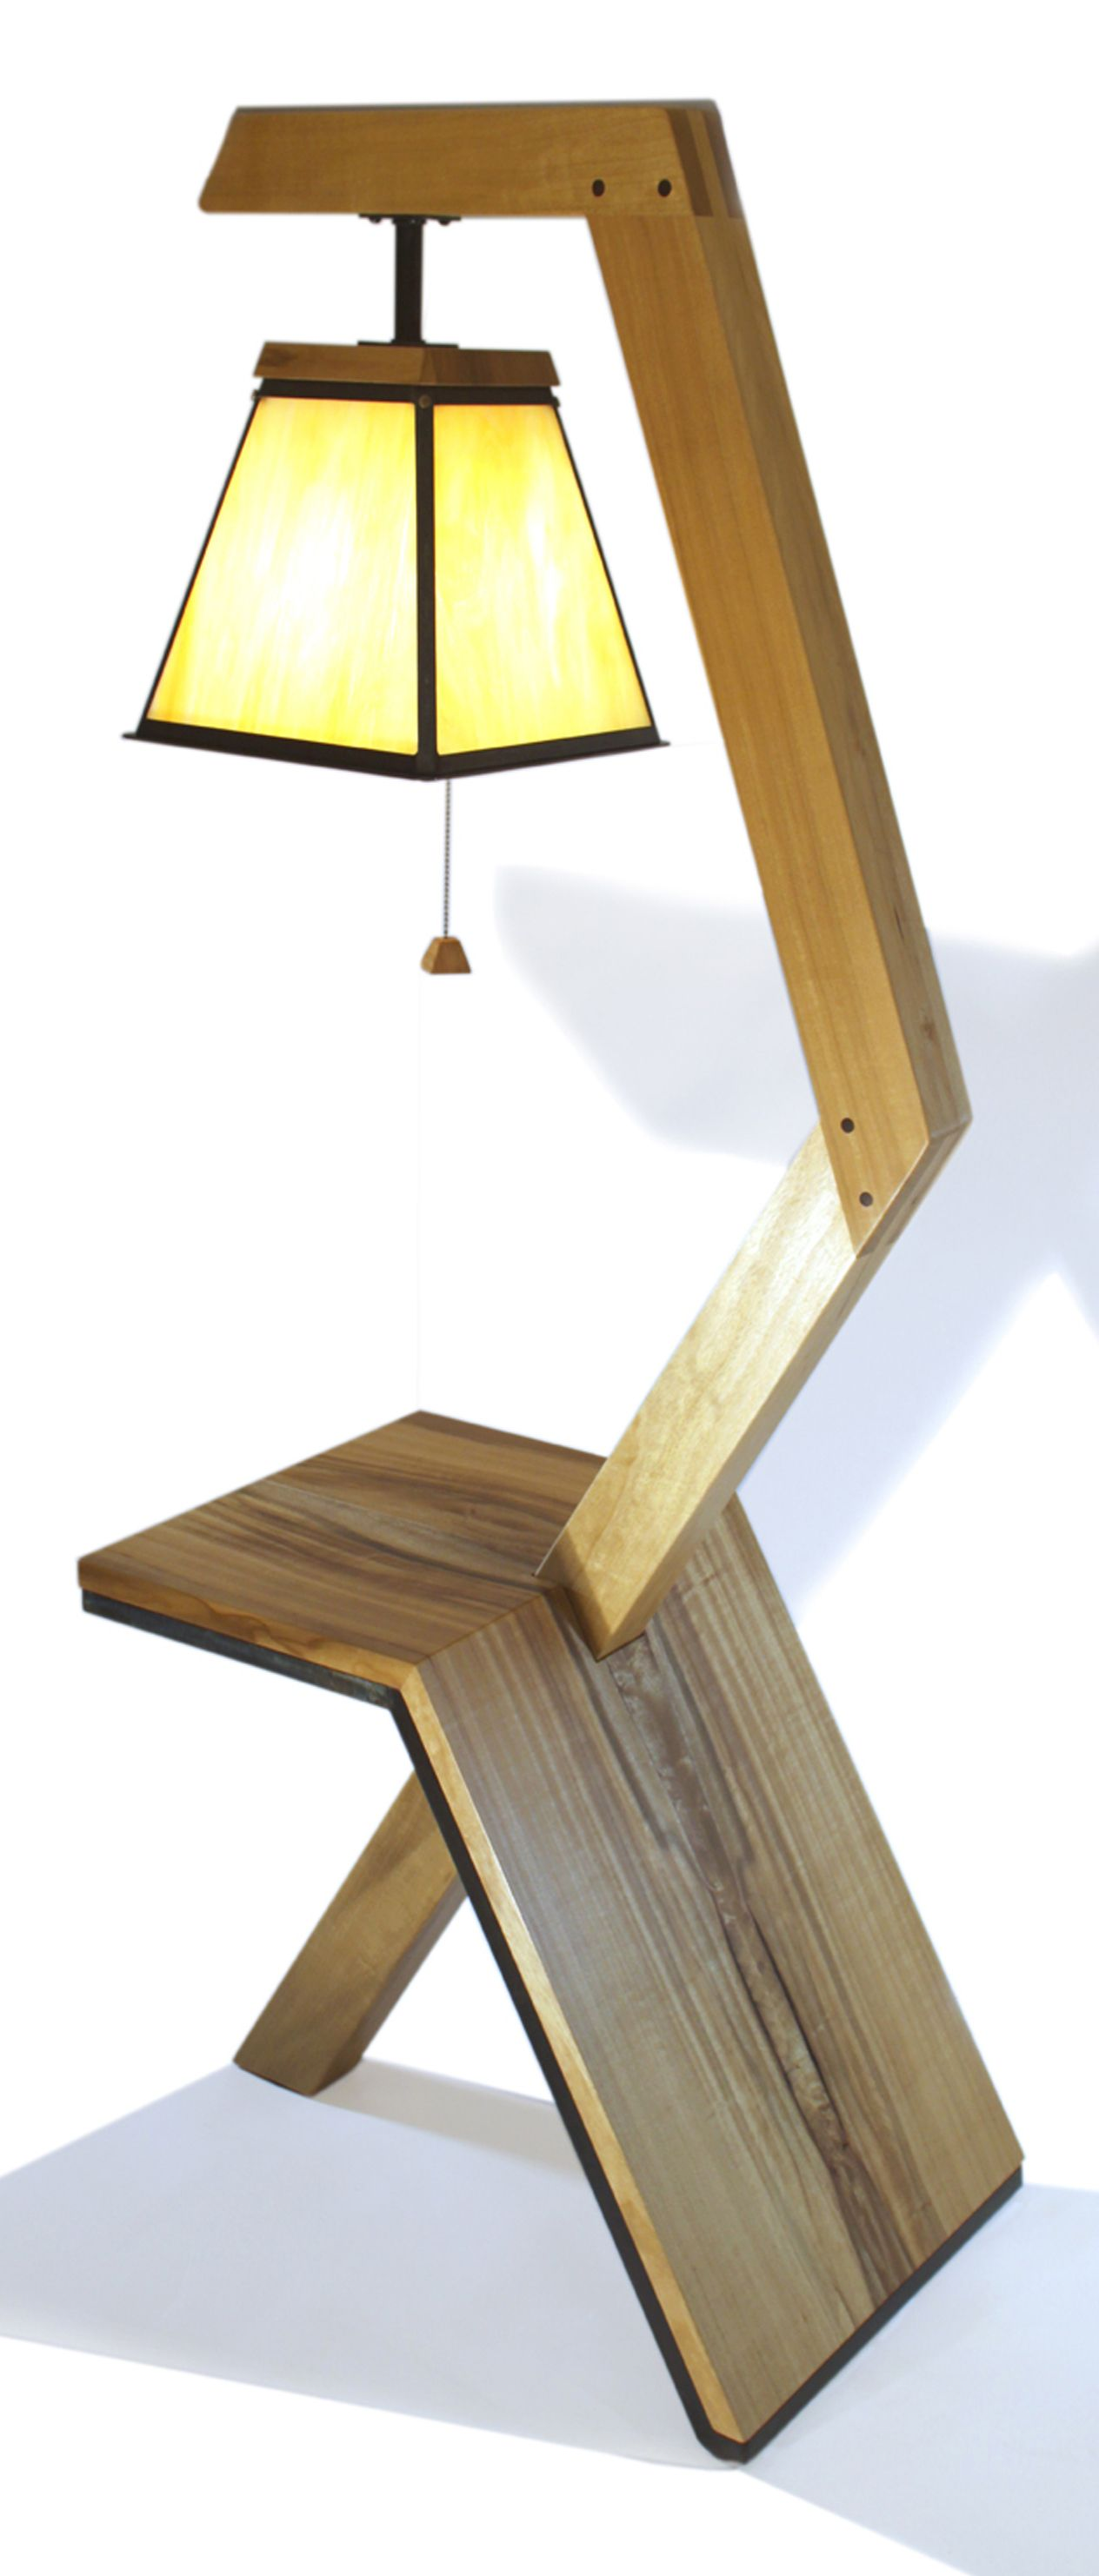 U201cTrinityu201d Figured Myrtle Wood Floor Lamp U0026 End Table Combo By Aaron Smith  Woodworking, $3800.00. U201c